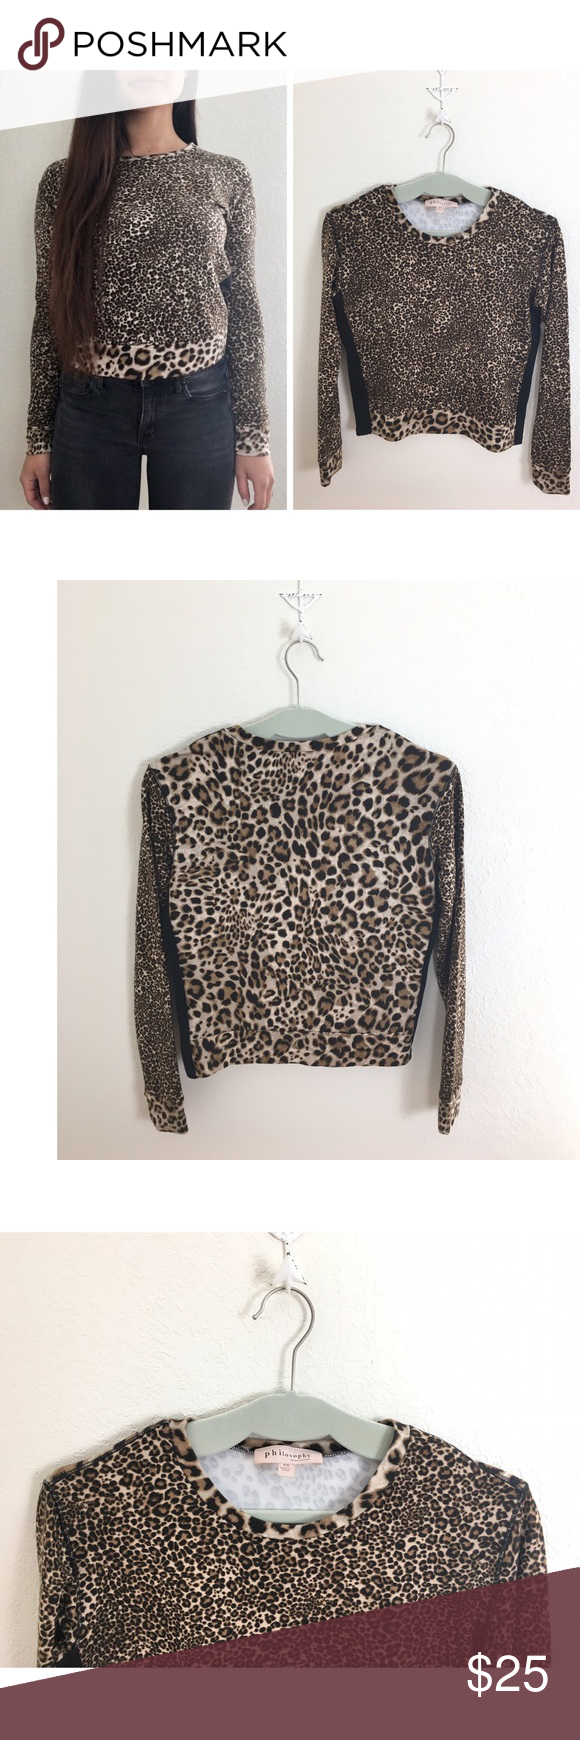 eb21b4501b59 Philosophy | Leopard Print Long Sleeve Top✨🖤✨ Measurements▫️Details coming  soon!